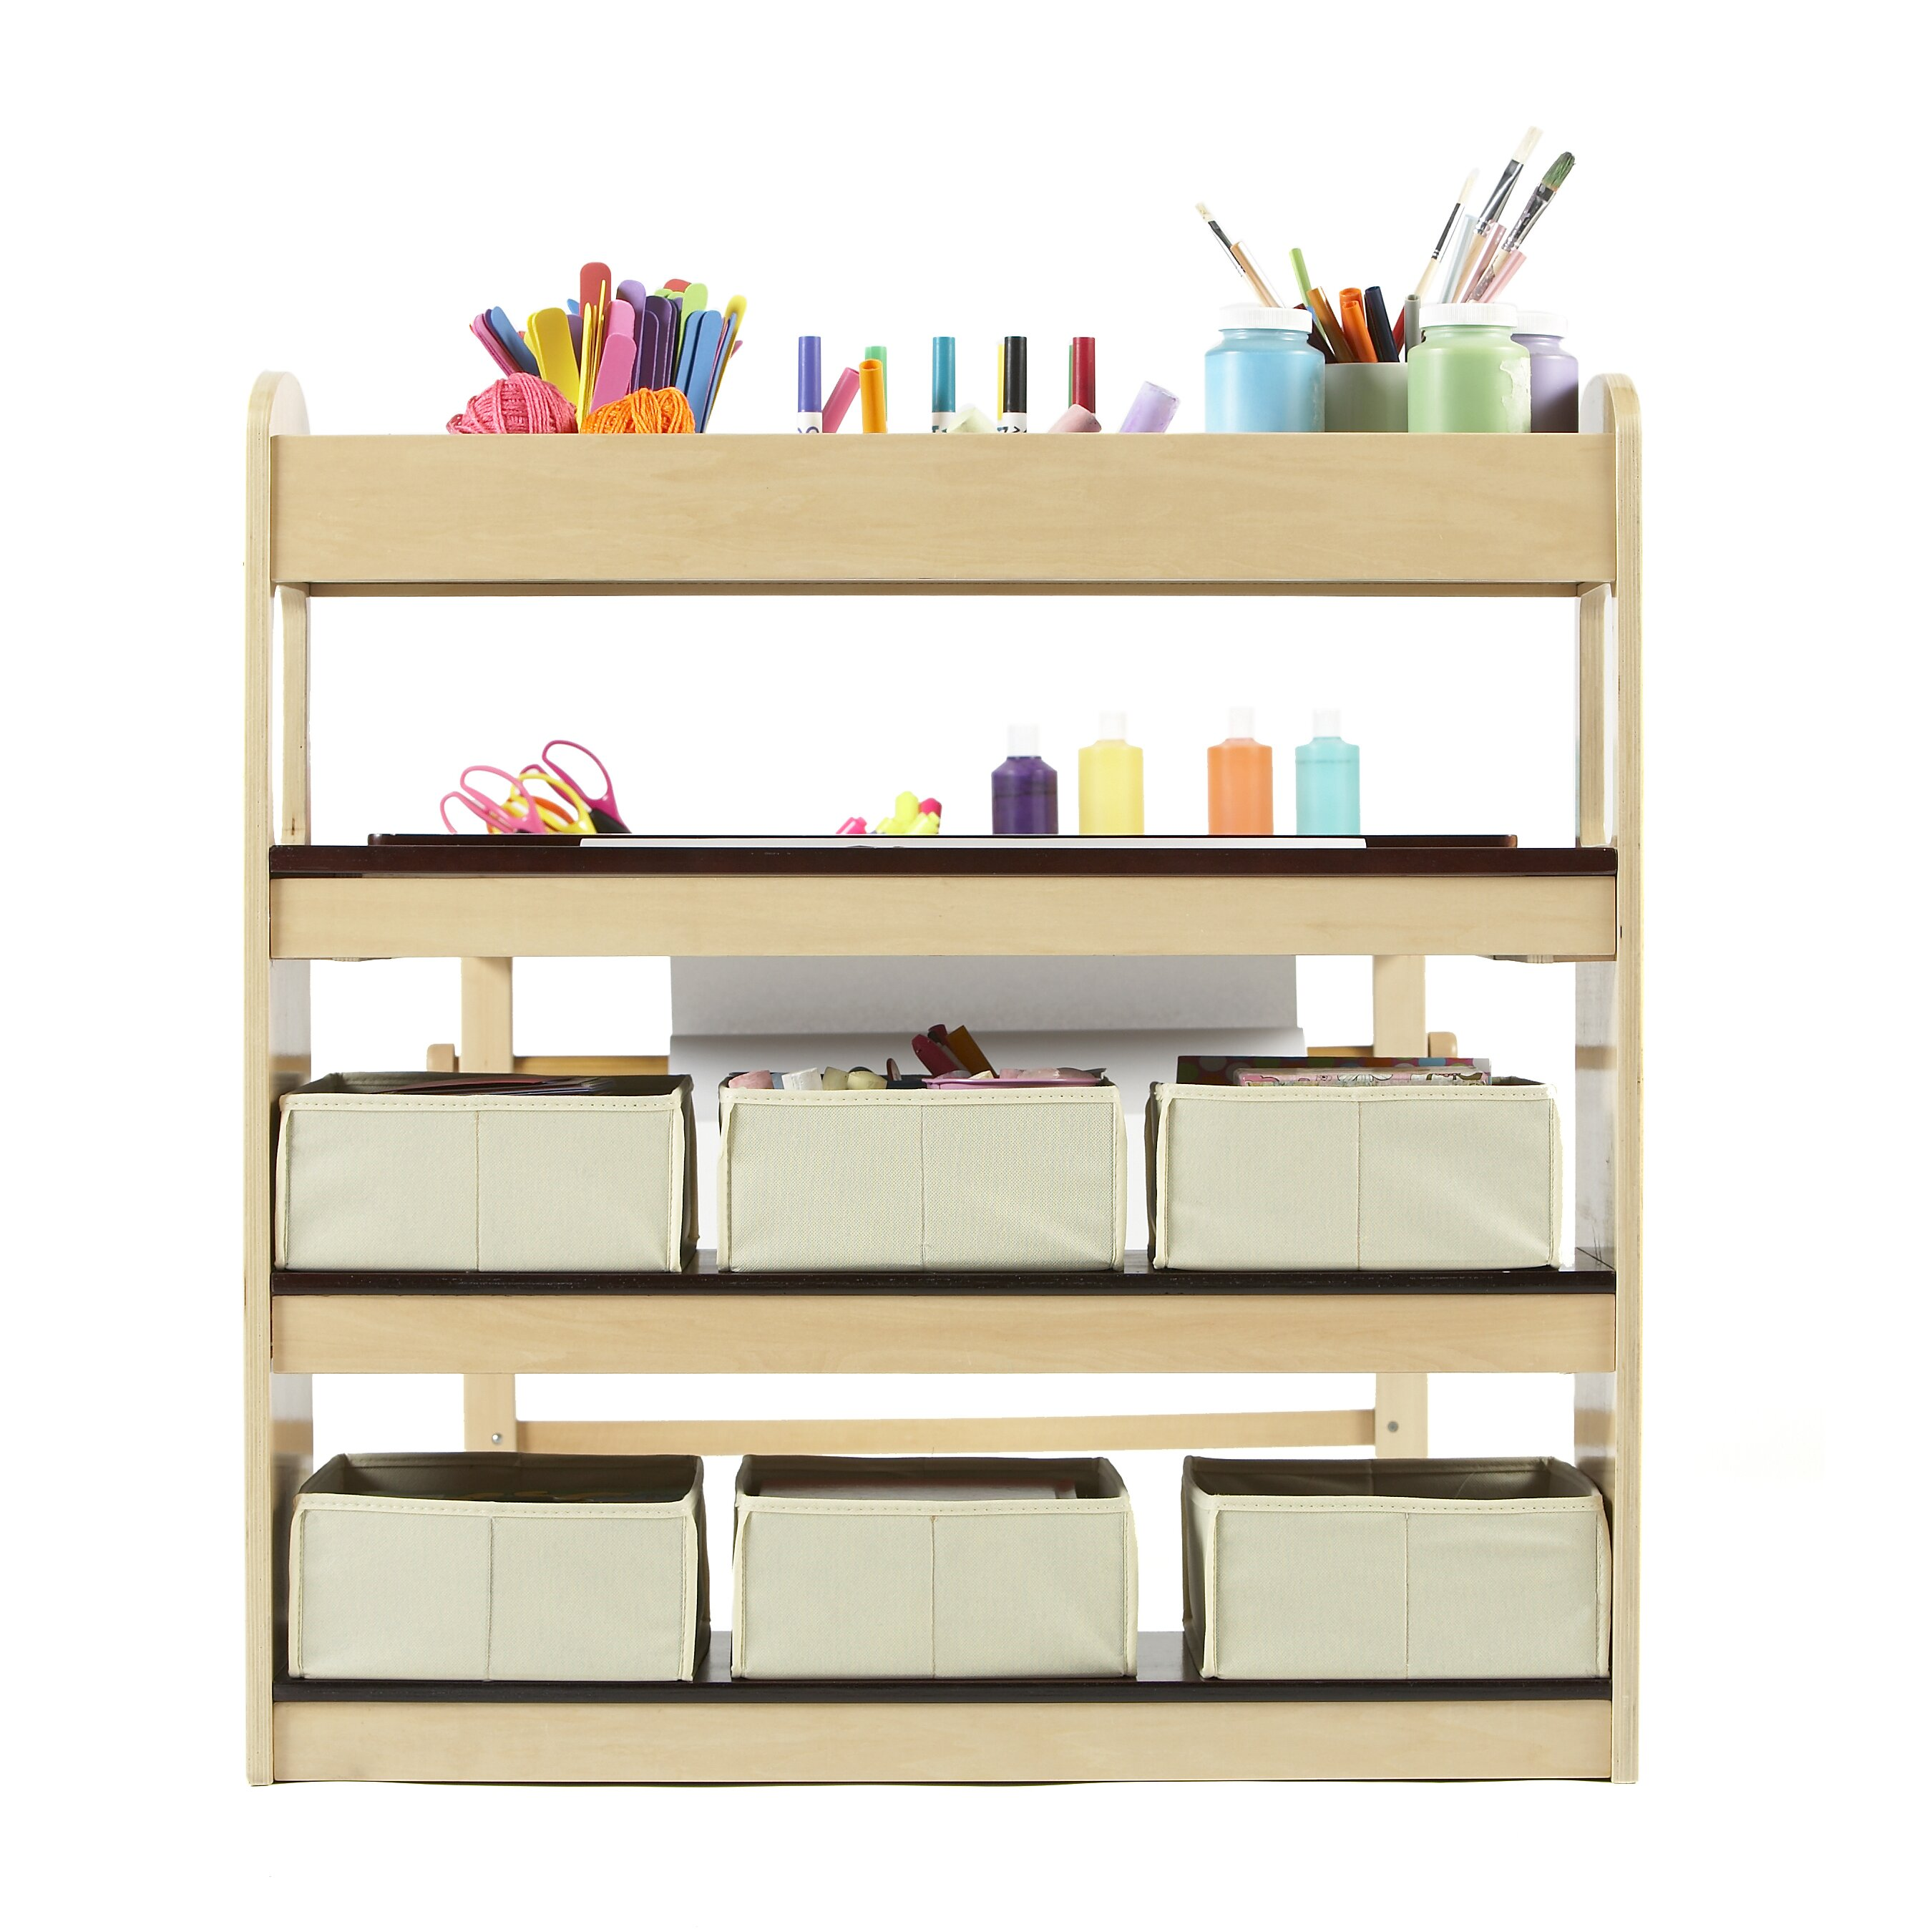 dwellstudio kids rectangular arts and crafts table. Black Bedroom Furniture Sets. Home Design Ideas